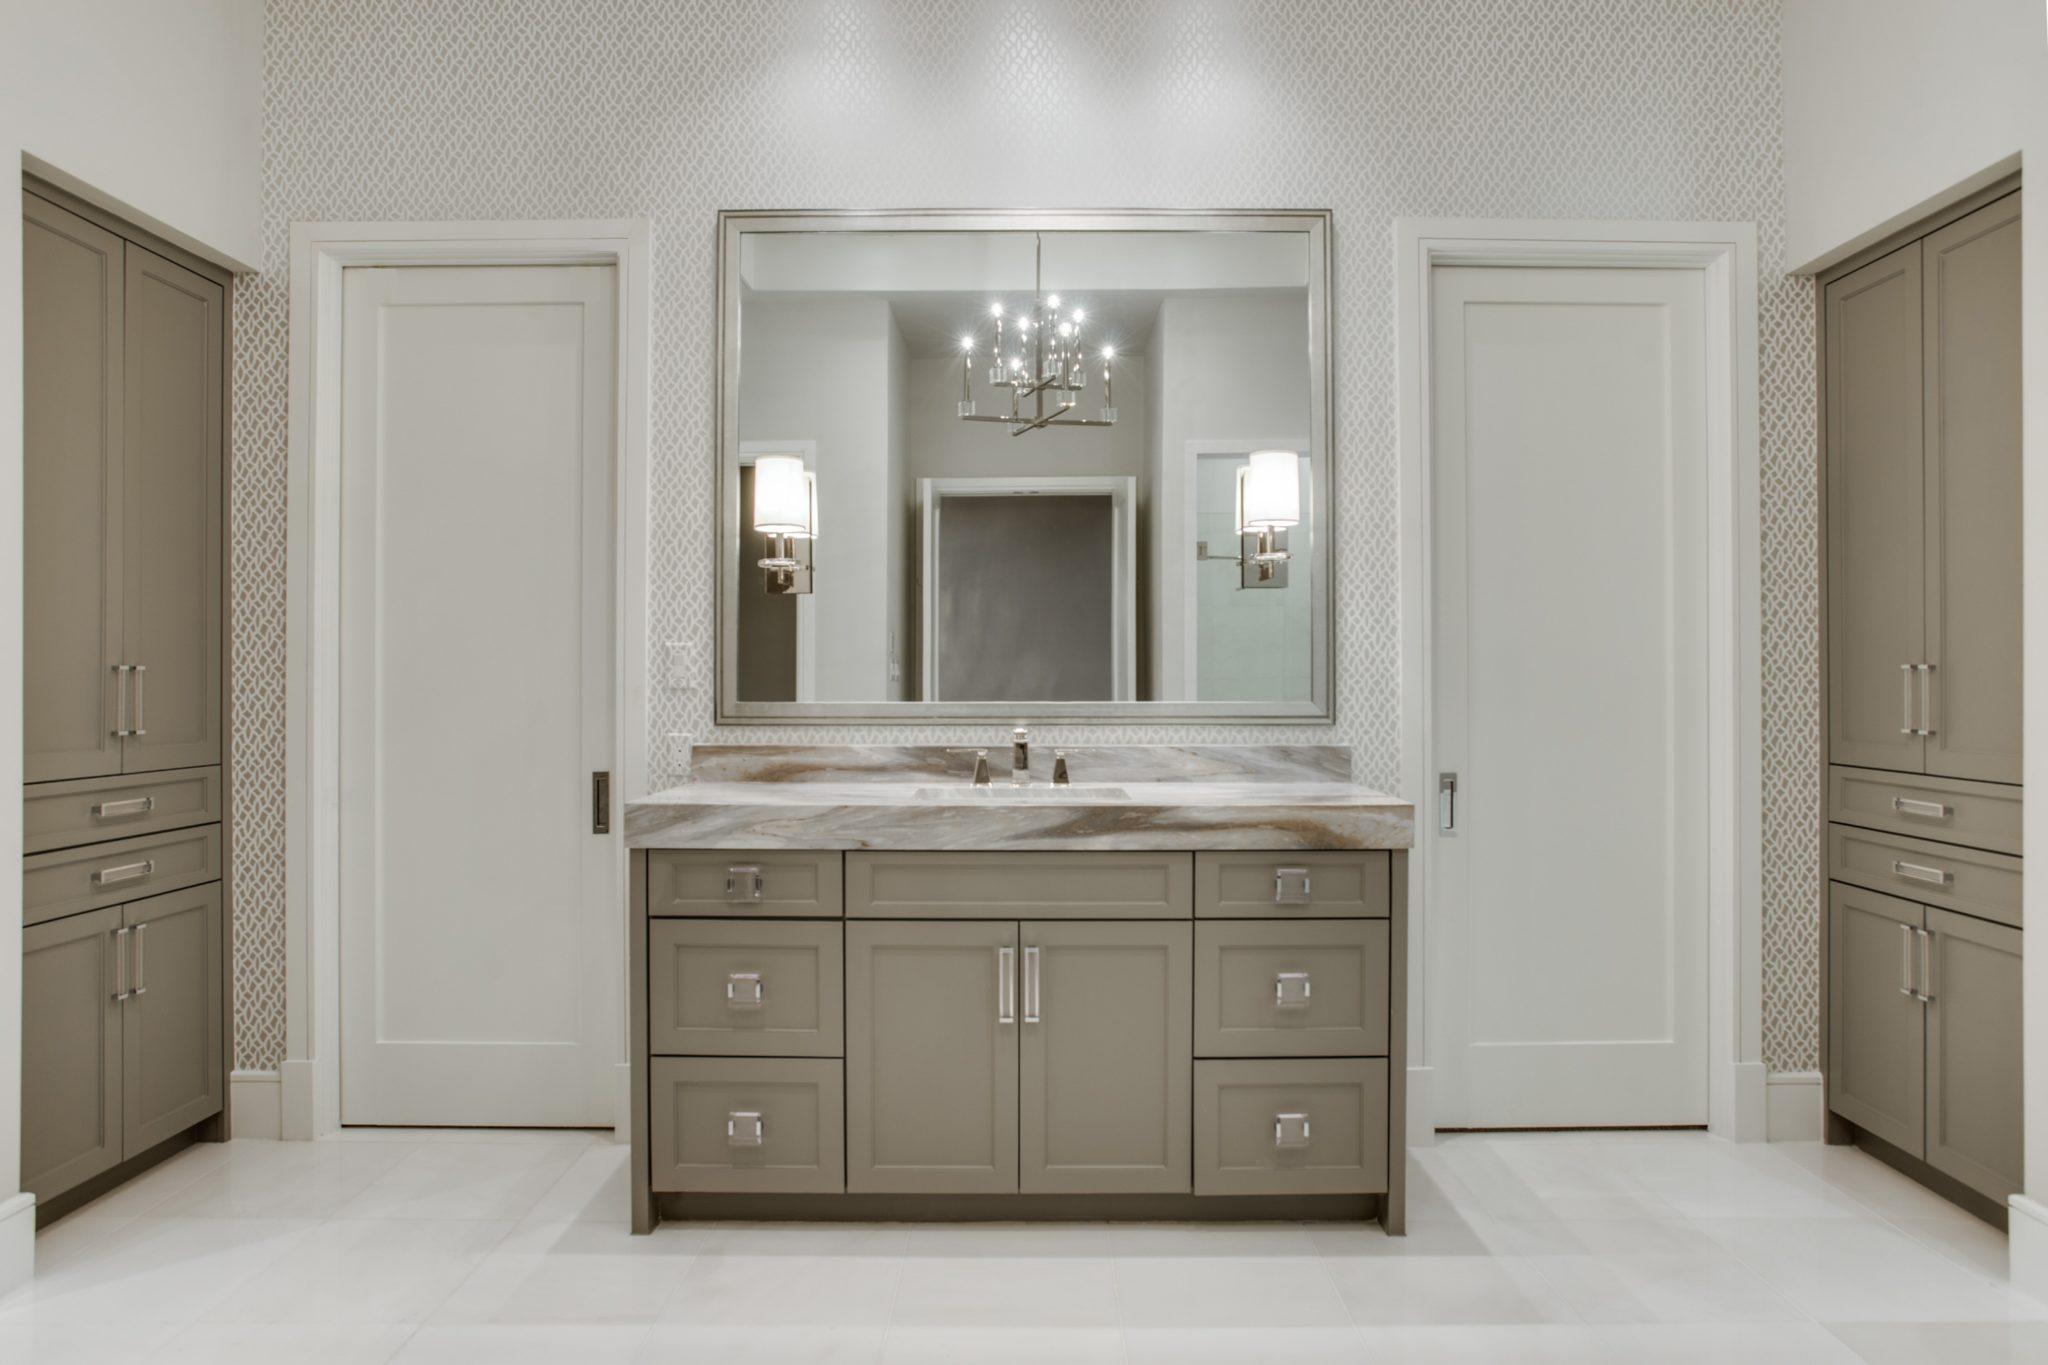 Preston Hollow Soft Contemporary, Master Bathroom, Vanity Wall by Allison Seidler Interiors